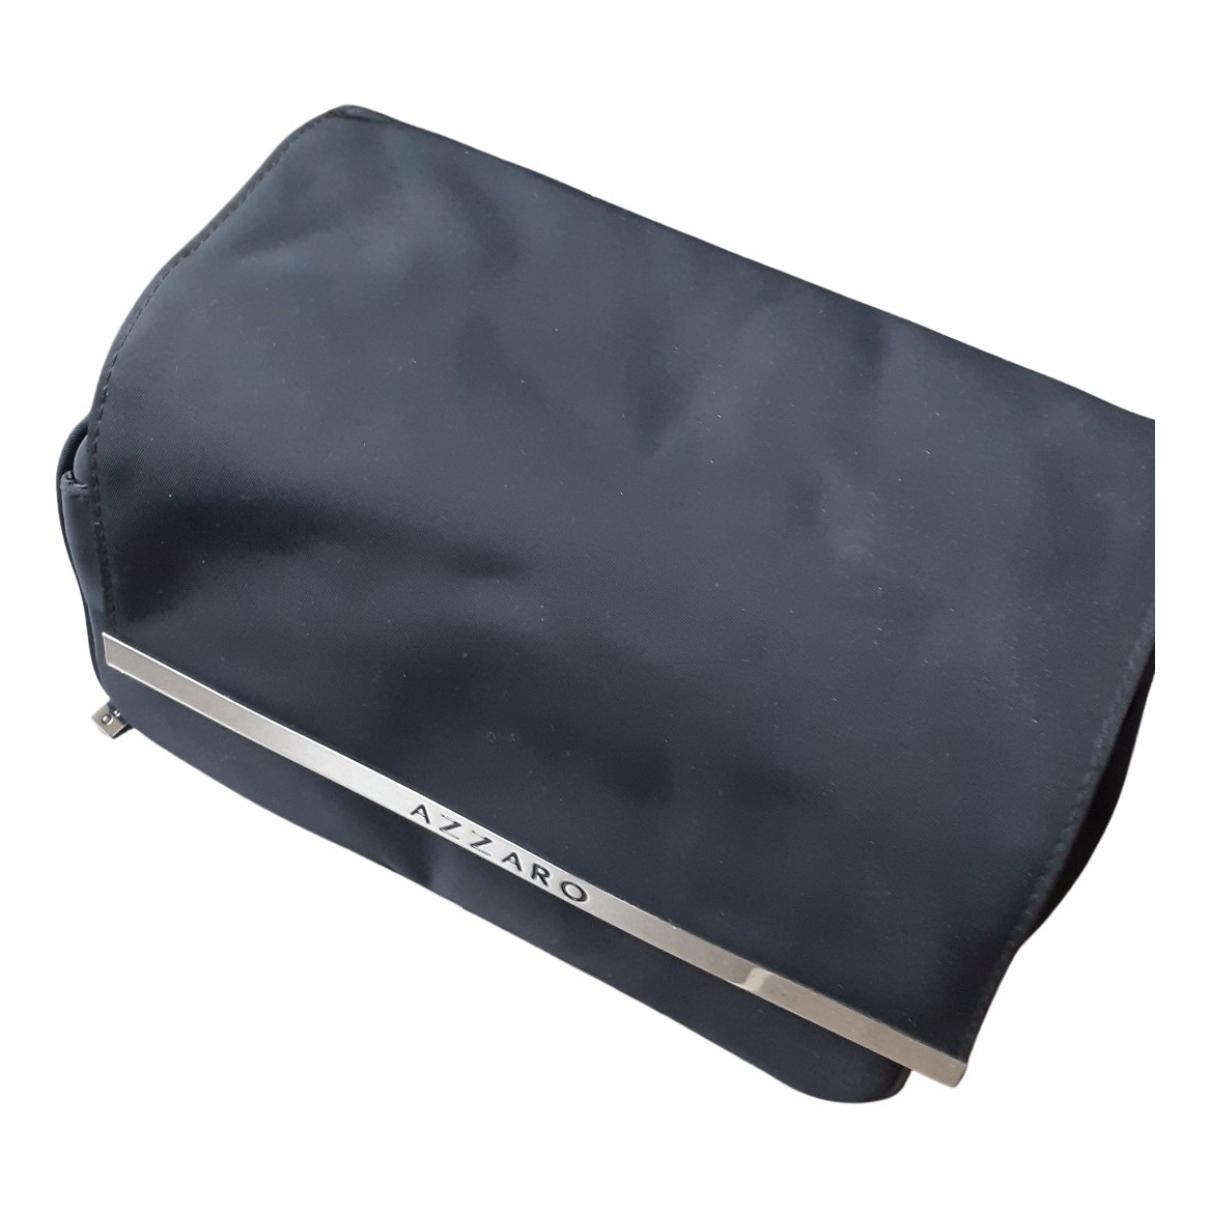 Azzaro N Black Cloth Small bag, wallet & cases for Men N